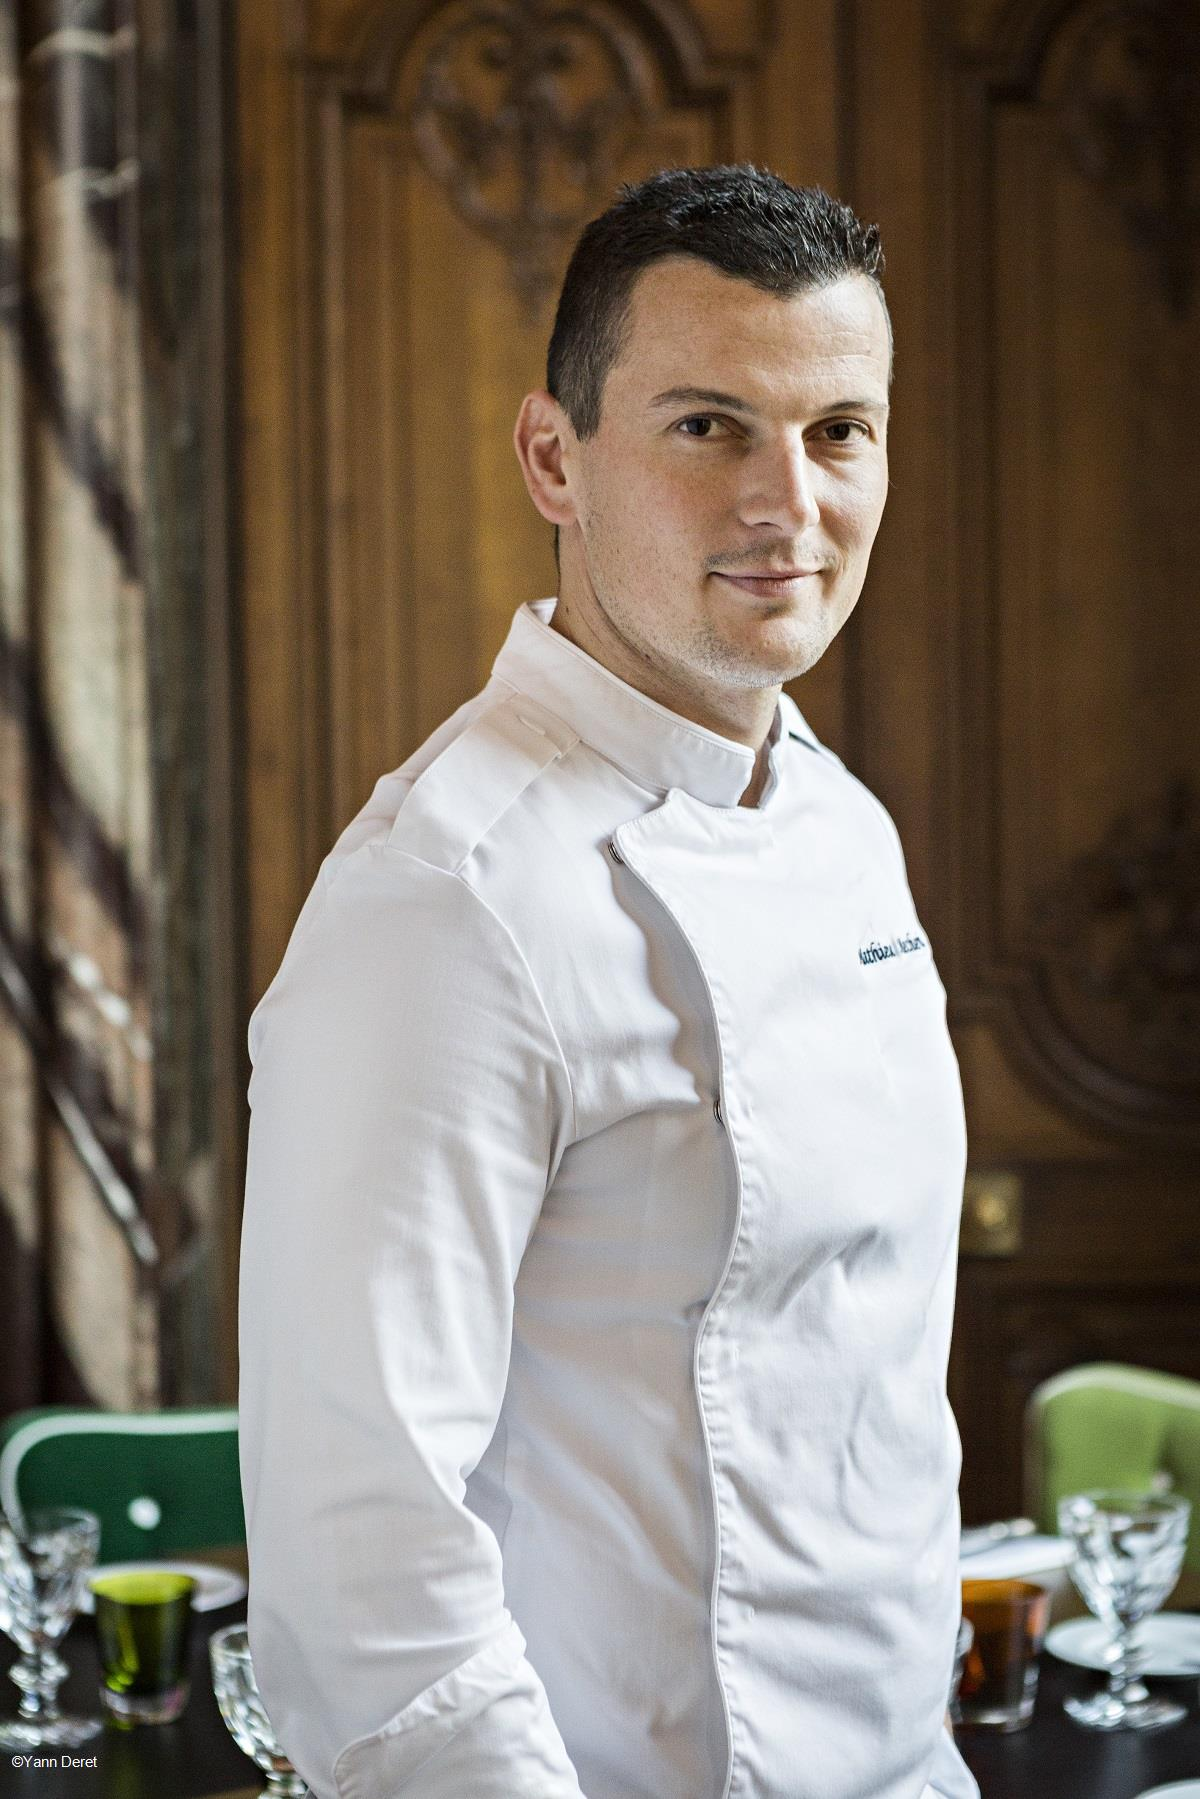 https://i1.wp.com/www.terroir-evasion.com/wp-content/uploads/2018/02/Cristal-room-Chef-Mathieu-M%C3%A9ch%C3%A9ri%C2%AEYann-Deret_c2i.jpg?ssl=1